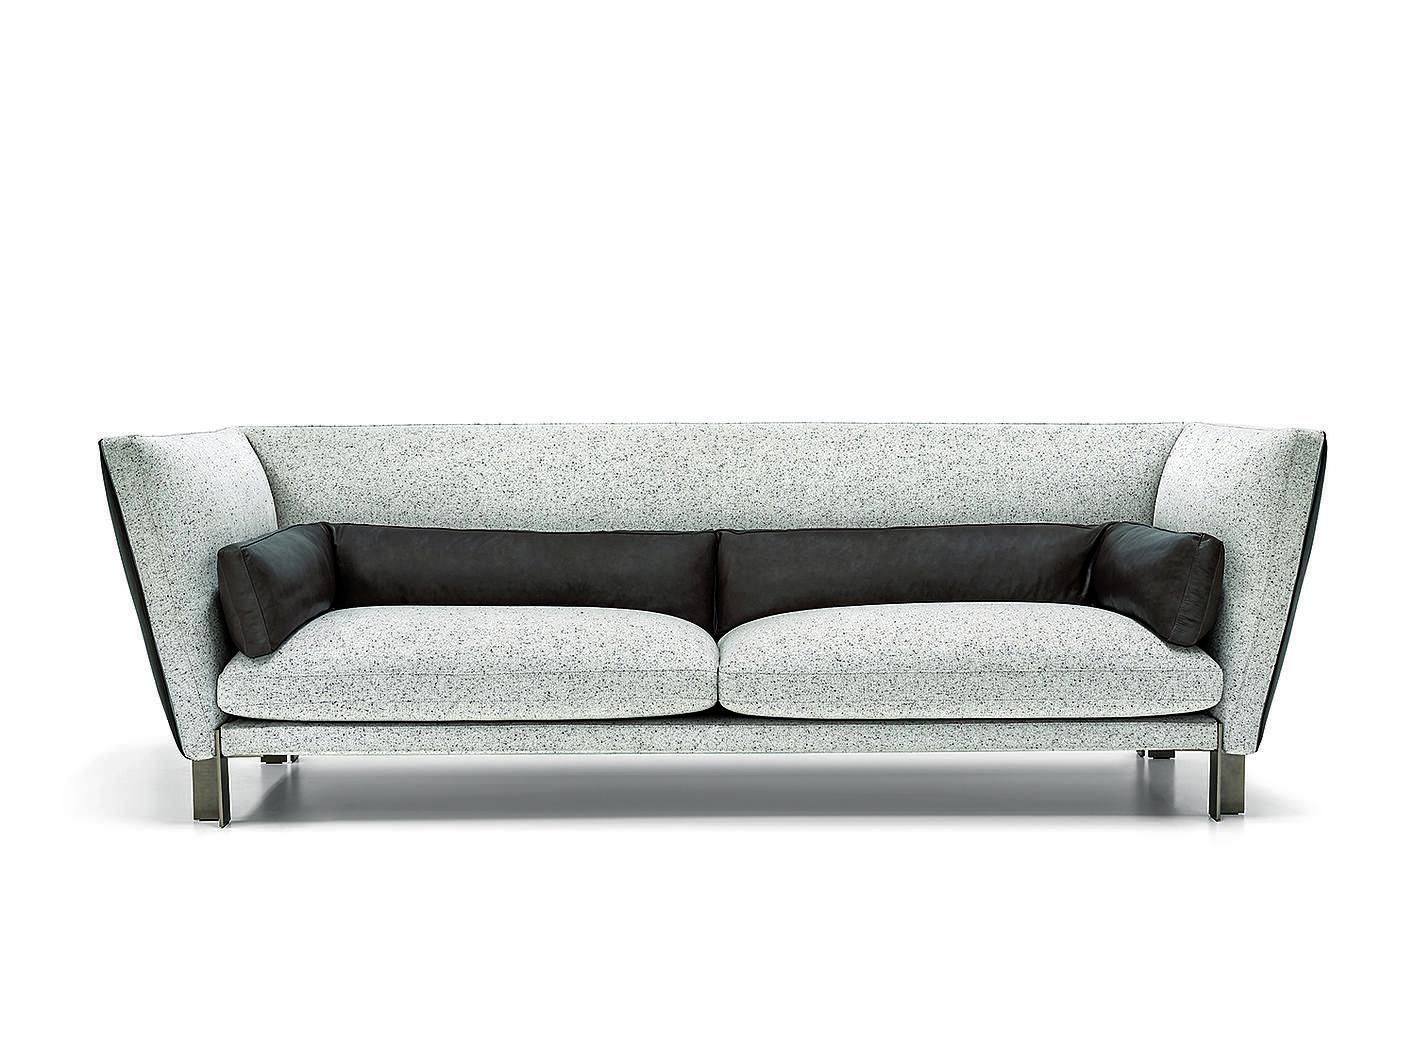 4 Modern Sofas By Arketipo Firenze In 2020 Modern Sofa Couch Design Modern Sofa Furniture